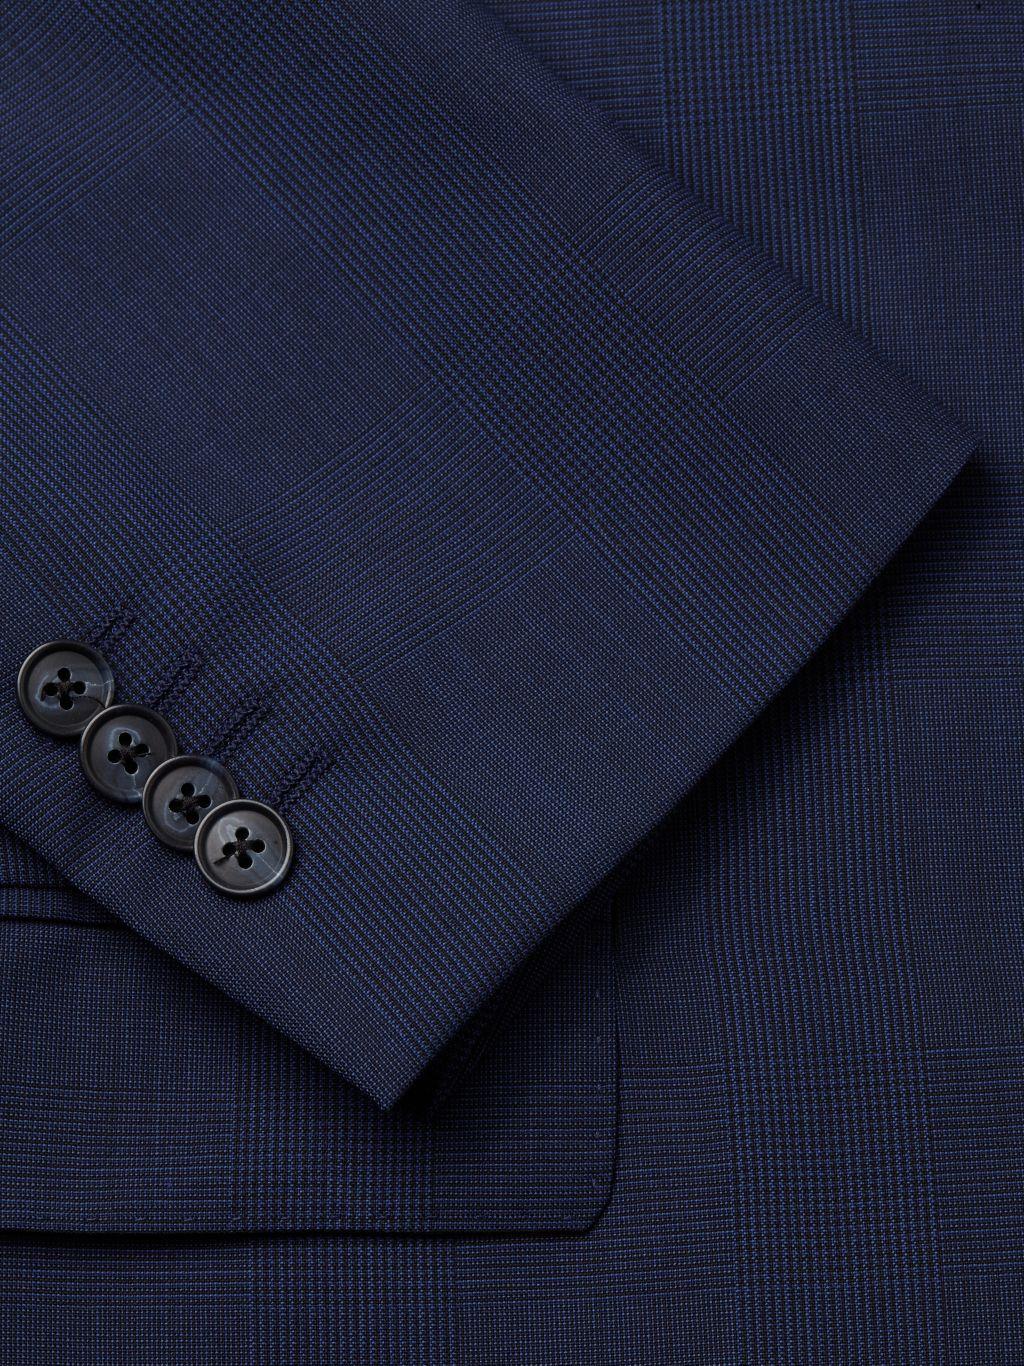 Michael Kors Collection Classic Slim-Fit Wool Suit